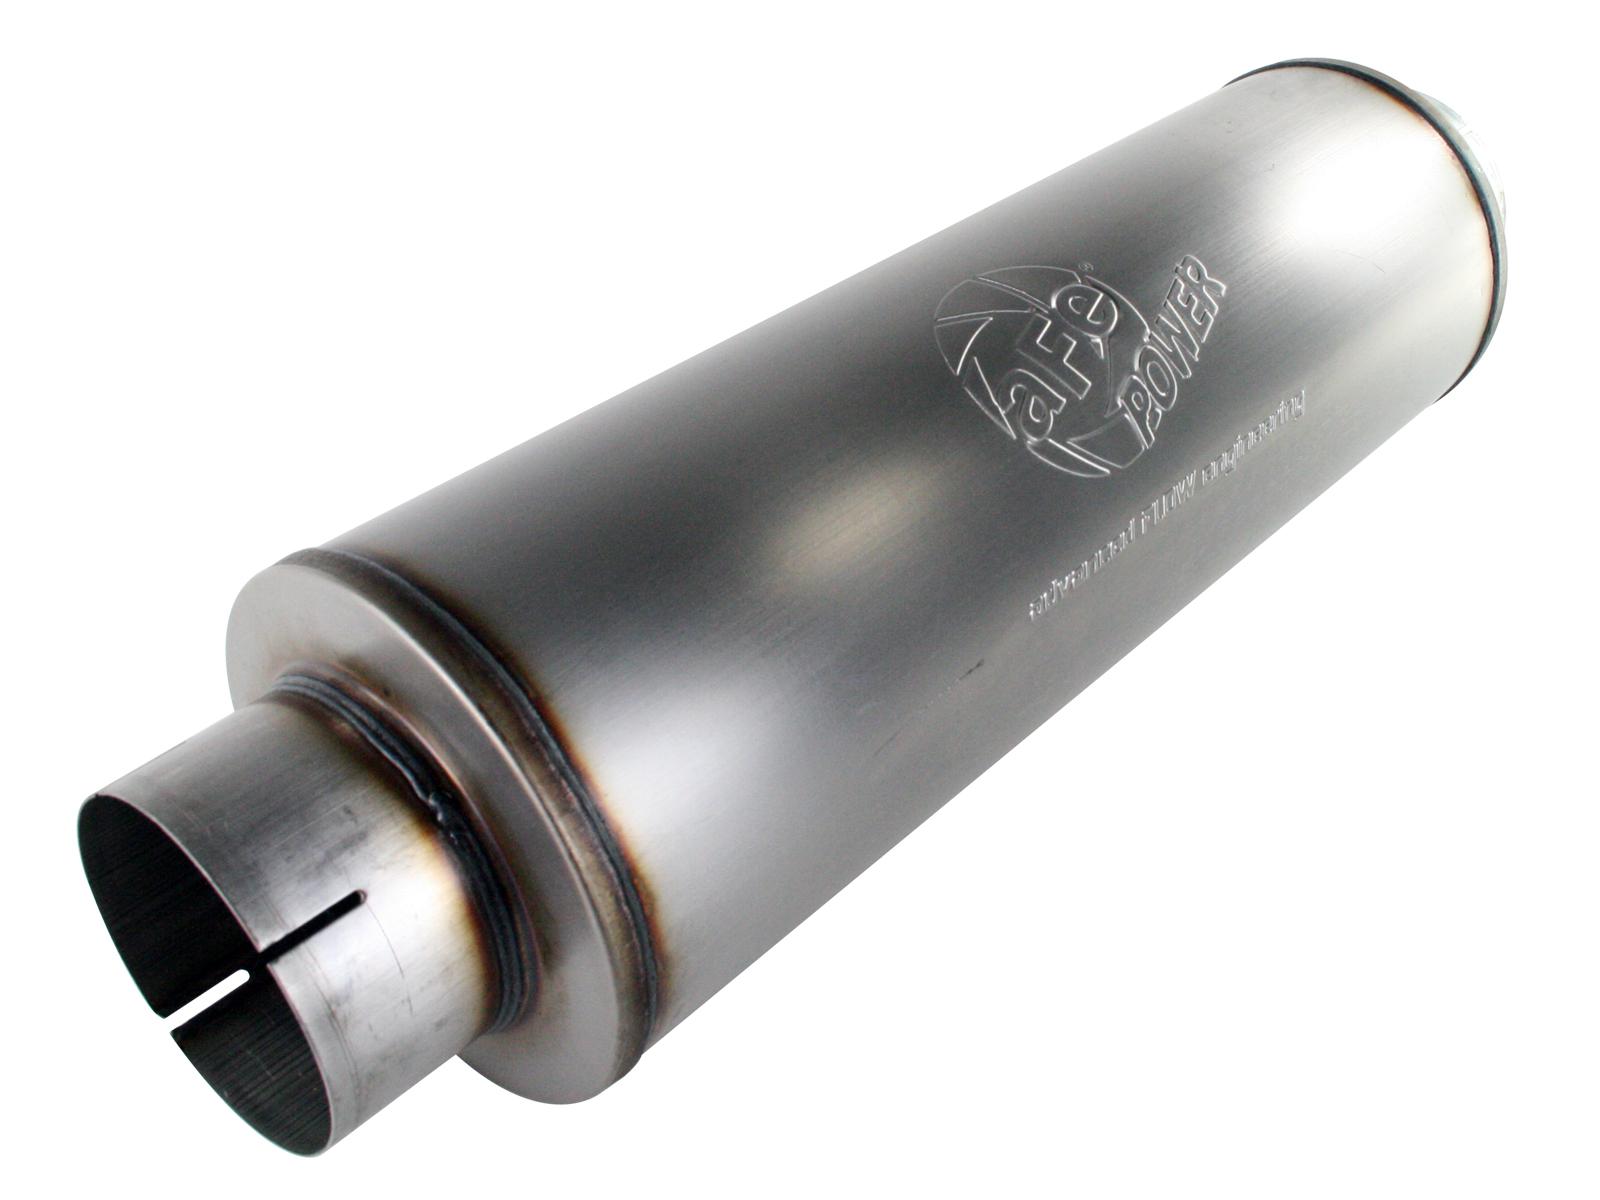 Universal muffler mach force 5 inch ID-OD 49-91012A1600